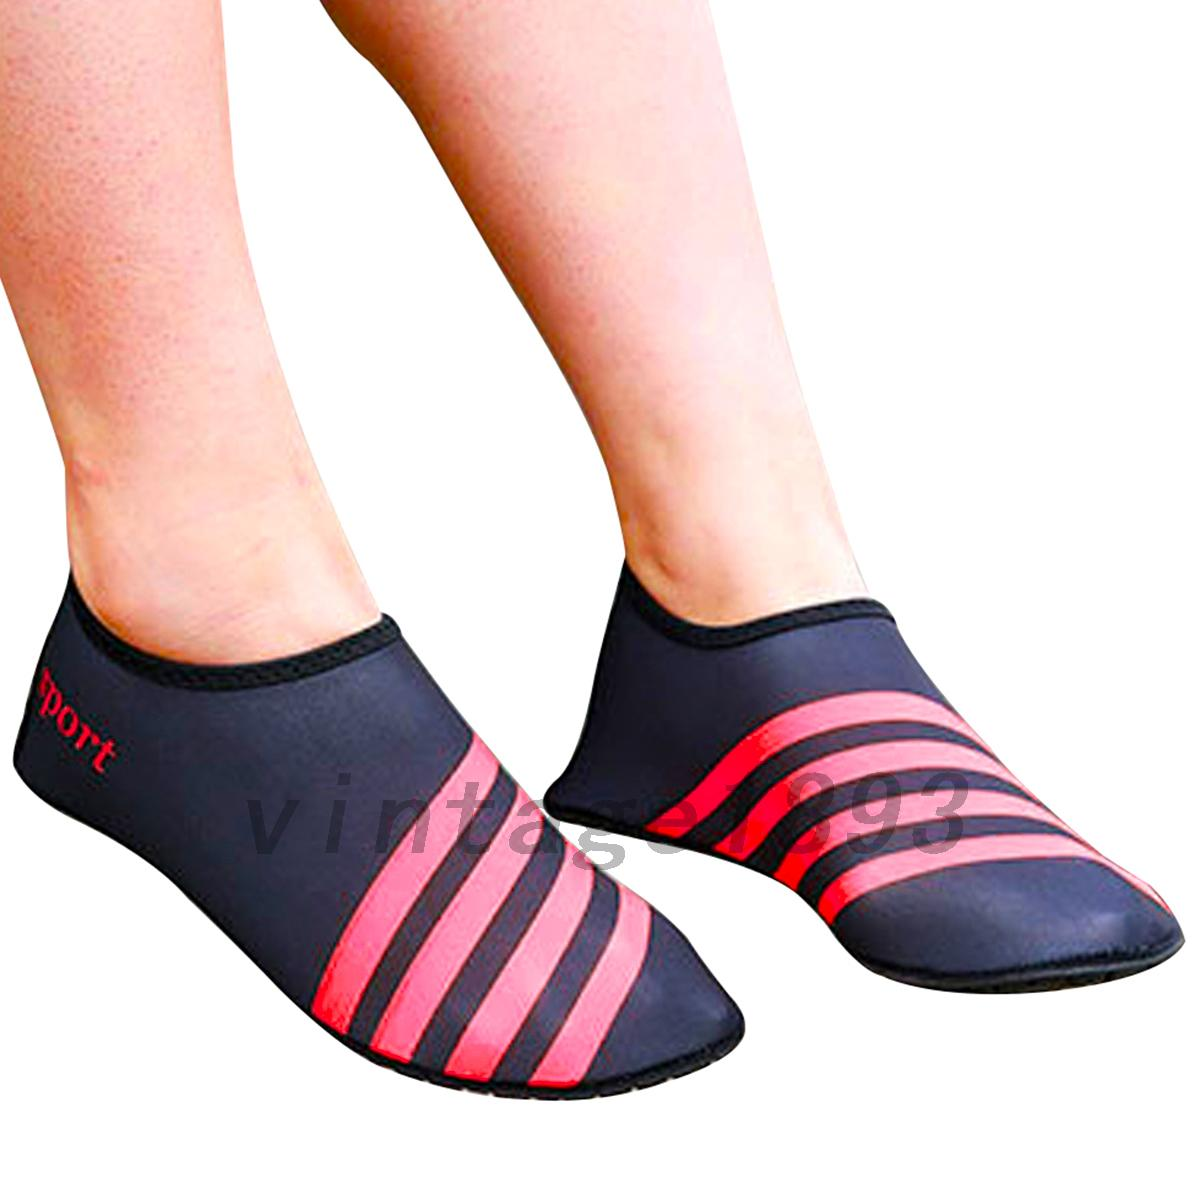 New Balcance Pool Shoes